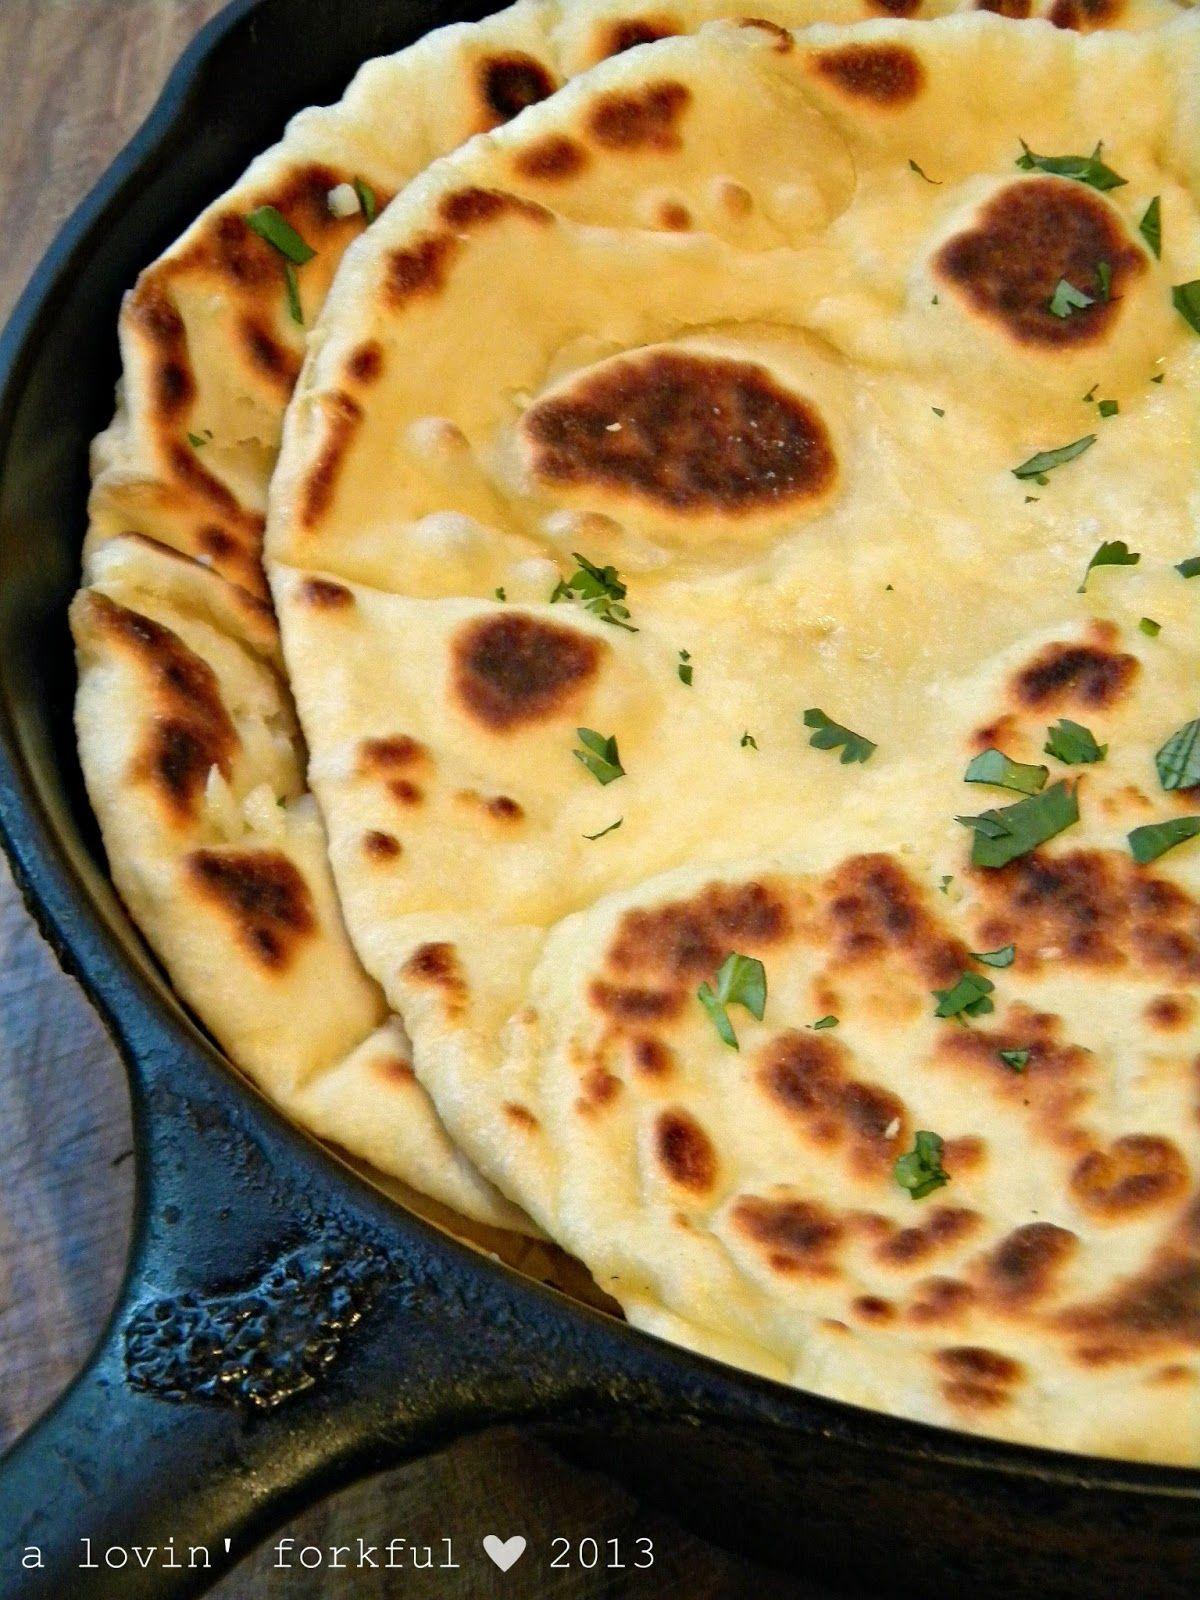 Garlic butter naan flatbread recipes breads pinterest naan garlic butter naan flatbread forumfinder Gallery